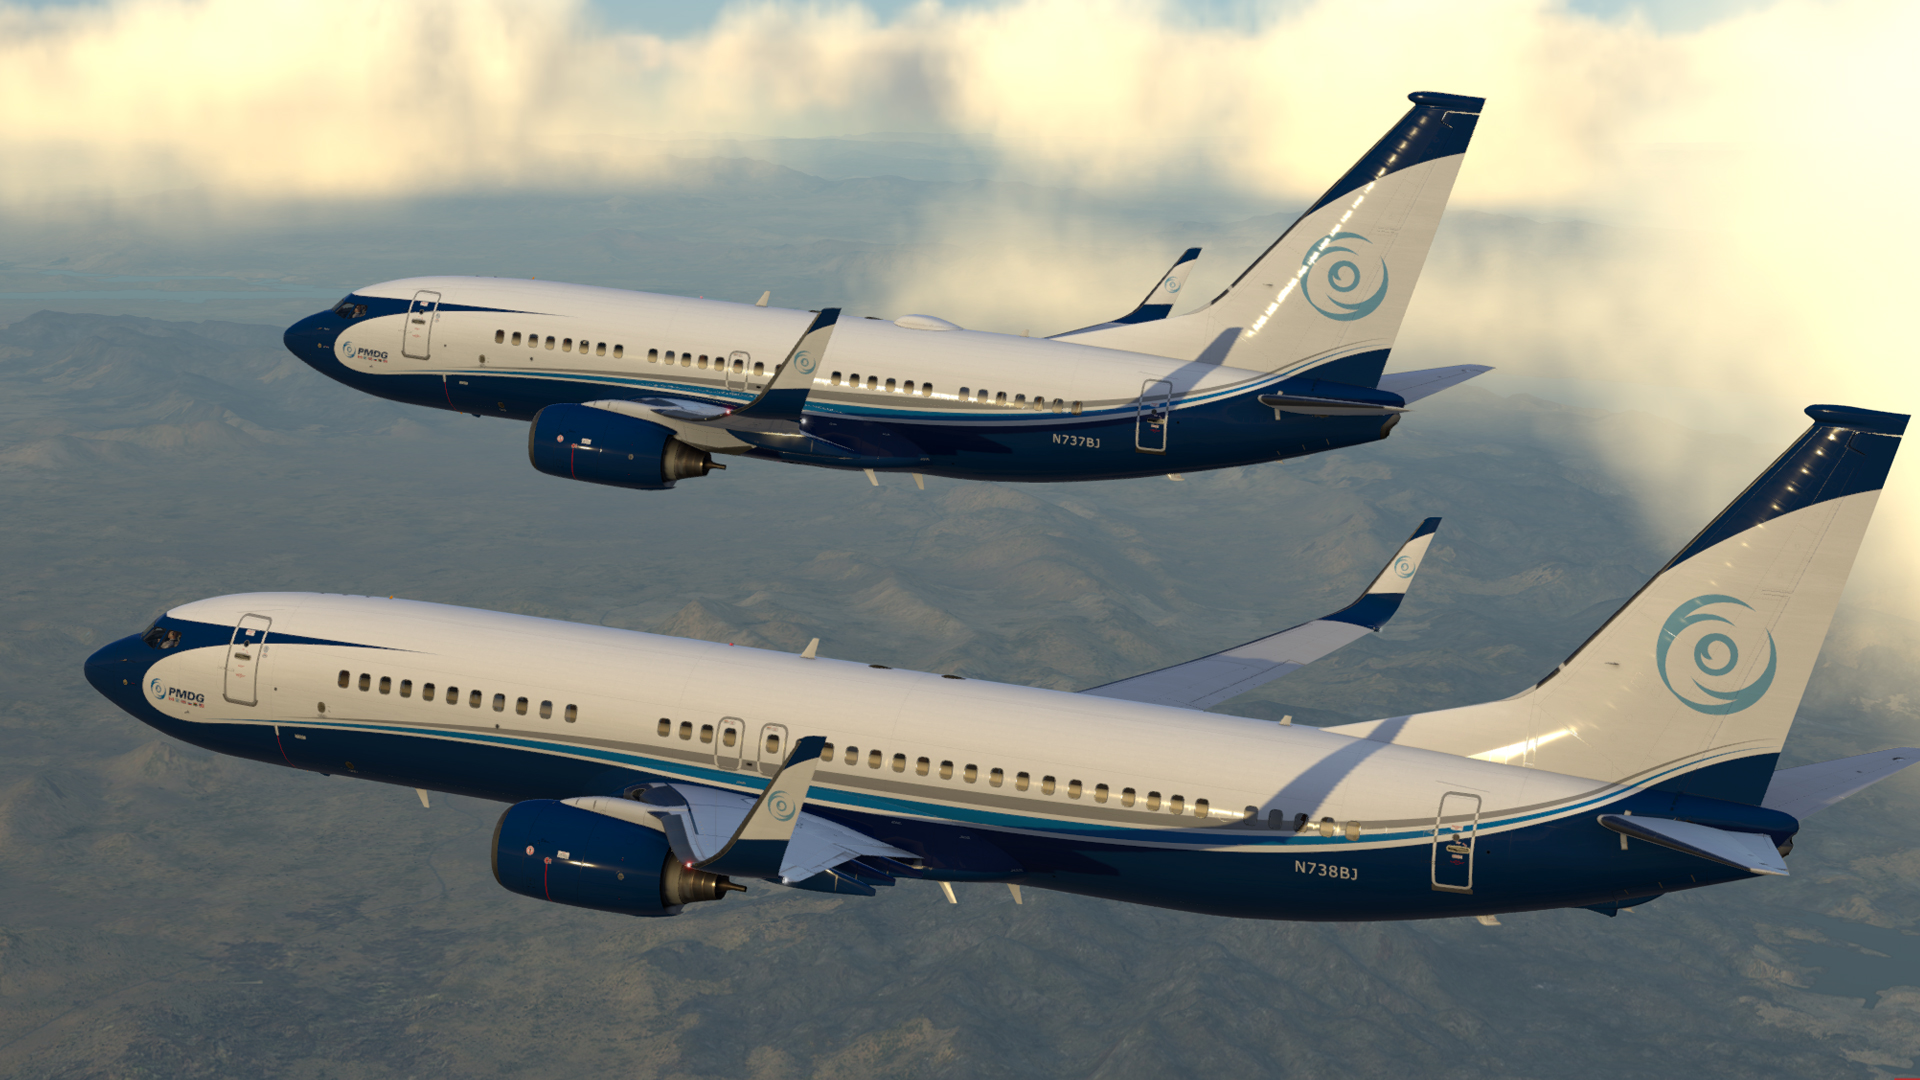 Pmdg 747 torrent